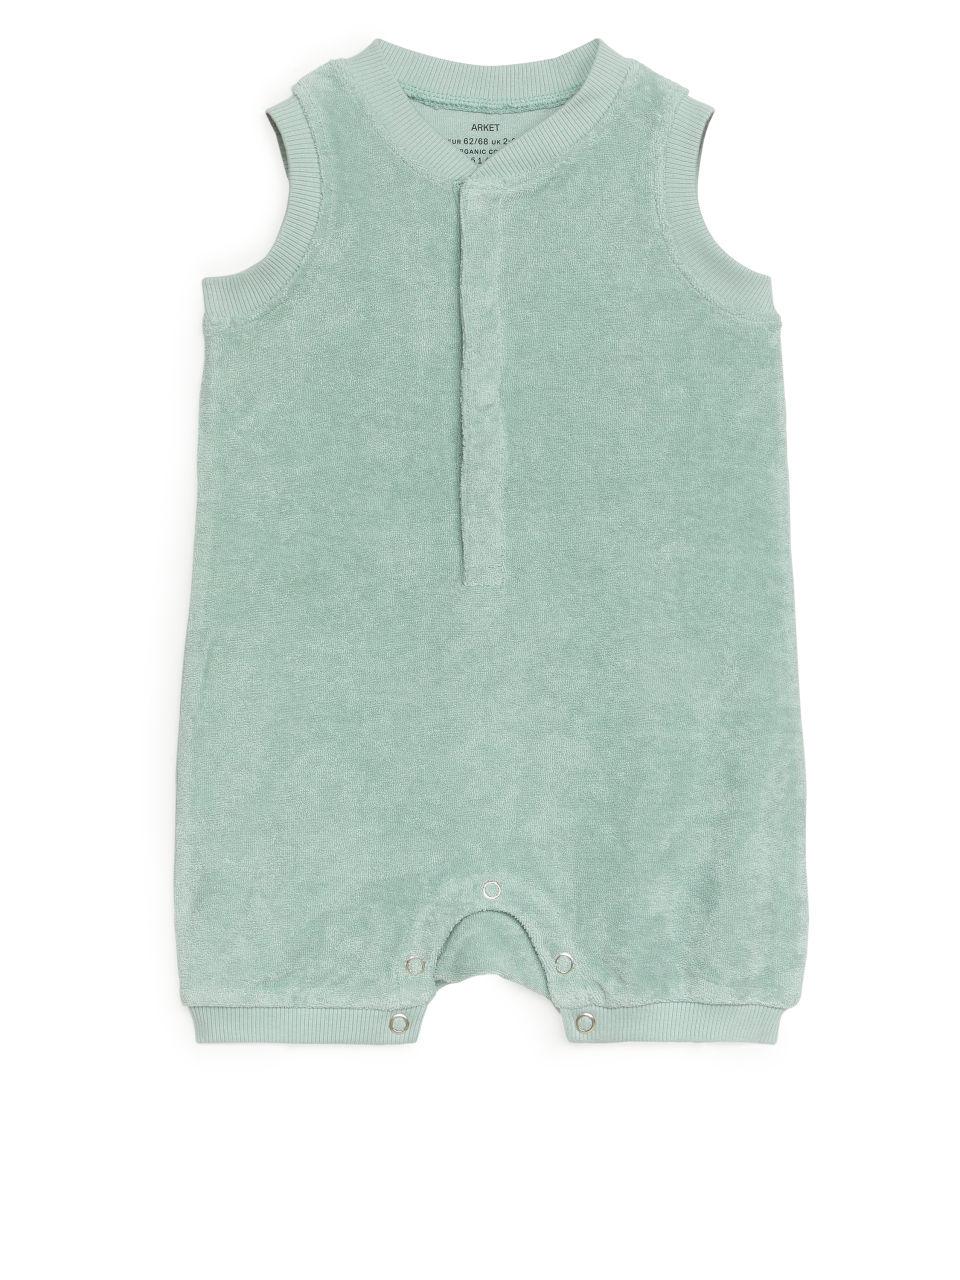 Sleeveless Towelling Romper - Turquoise